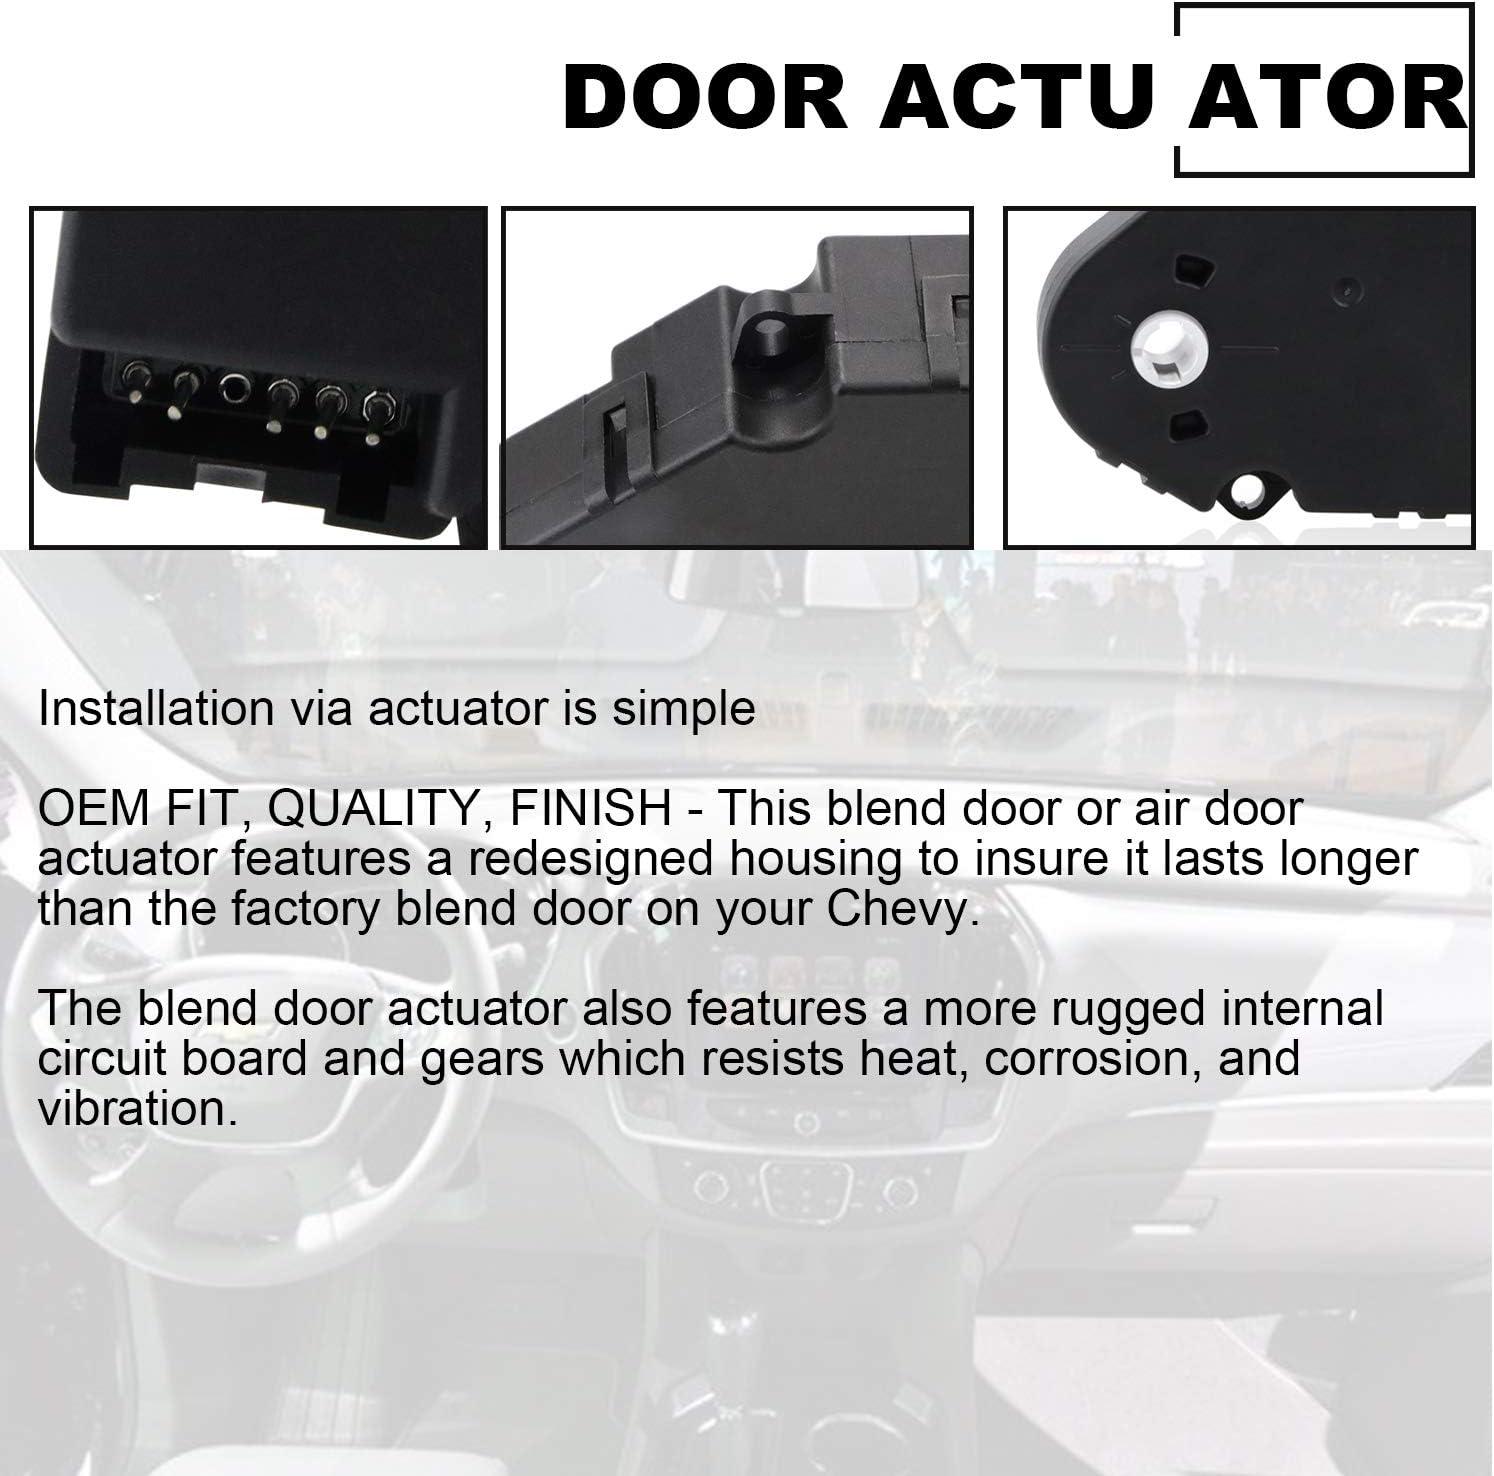 Suburban HVAC Blend Control Actuator Heater Air Door Actuator Motor 89018365 604-106 52402588 16163982 52402598 52402612 15-72971 for Chevrolet Silverado Tahoe; GMC Sierra Yukon; Cadillac Escalad